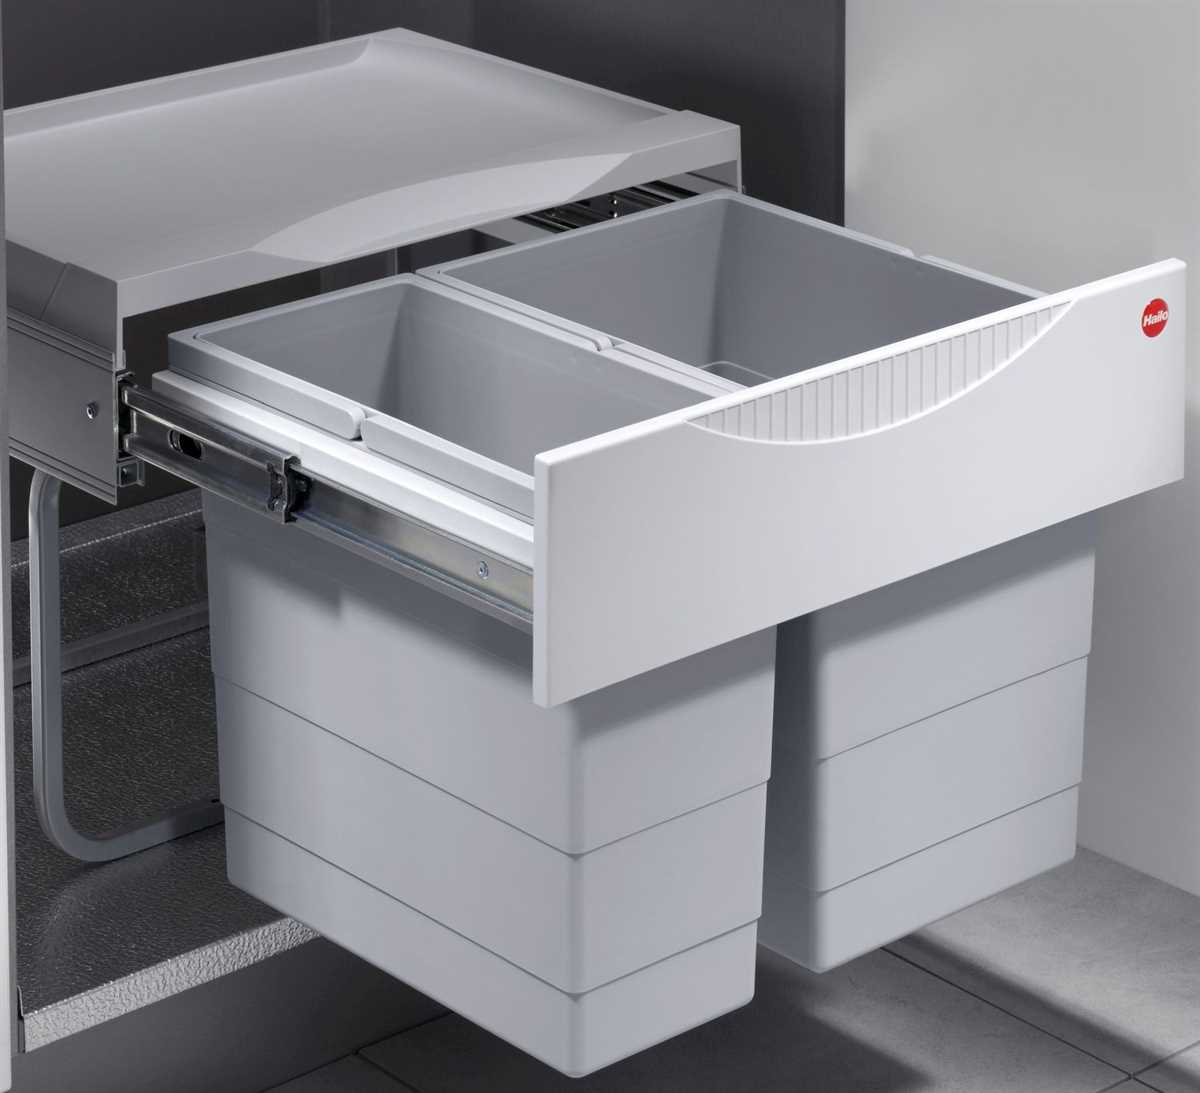 Full Size of Müllsystem Mlleimer Kche 30 L Hailo Tandem Abfalleimer Real Küche Wohnzimmer Müllsystem